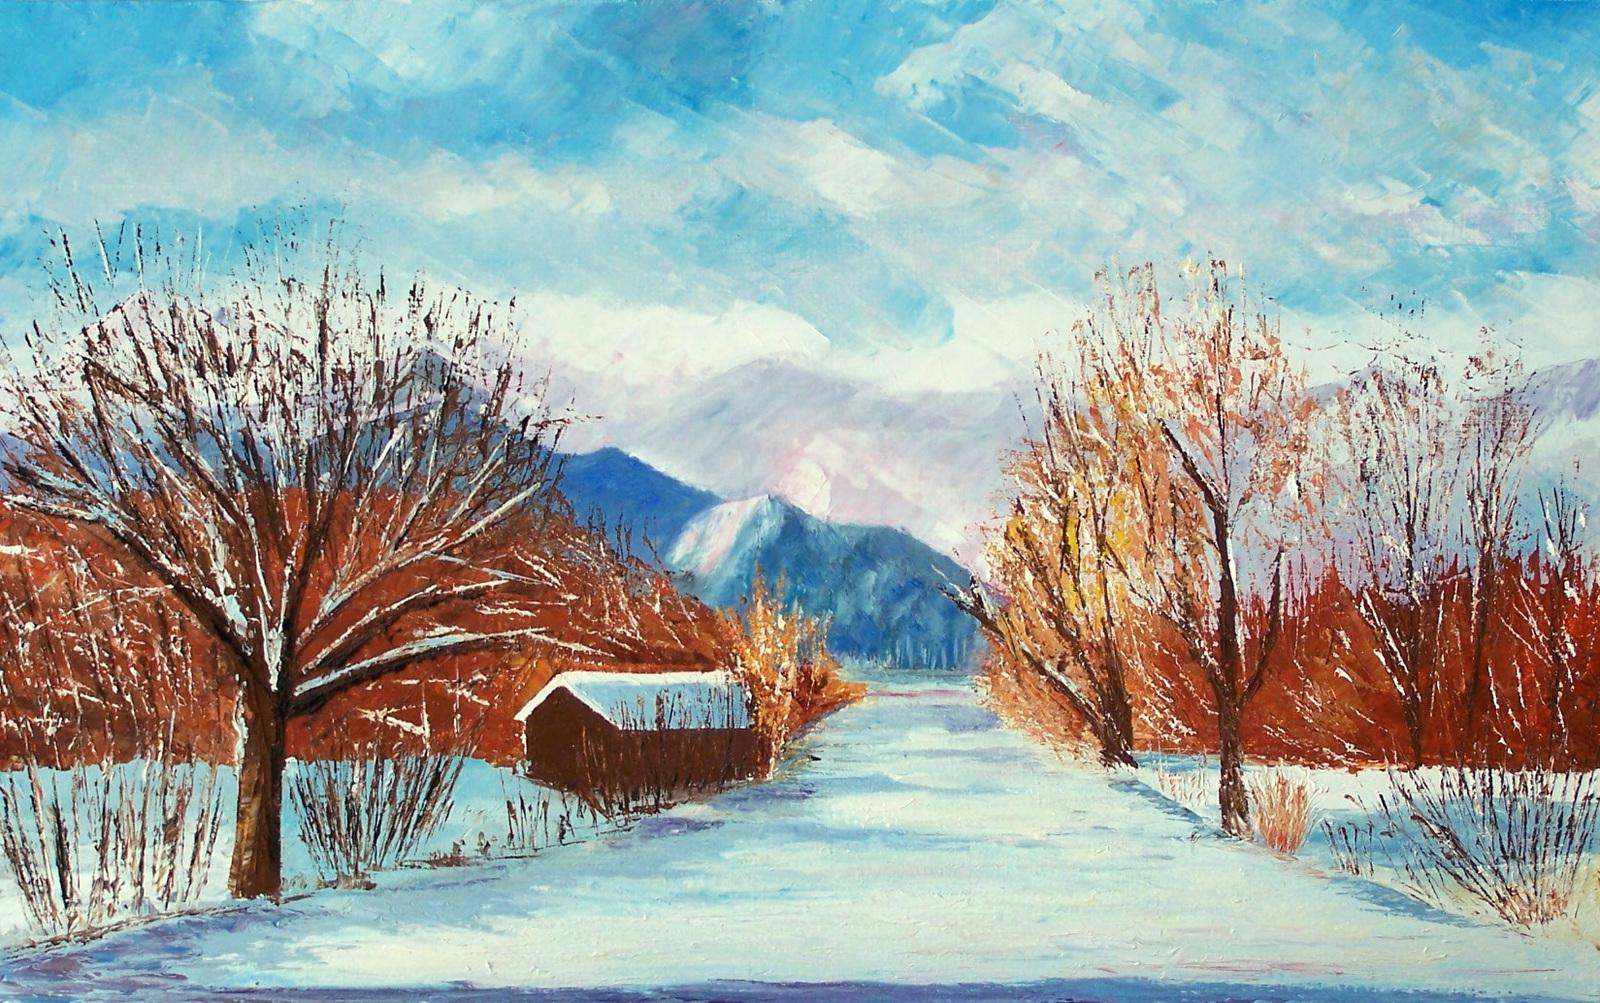 paysage d 39 hiver peinture fonds d 39 cran hd. Black Bedroom Furniture Sets. Home Design Ideas